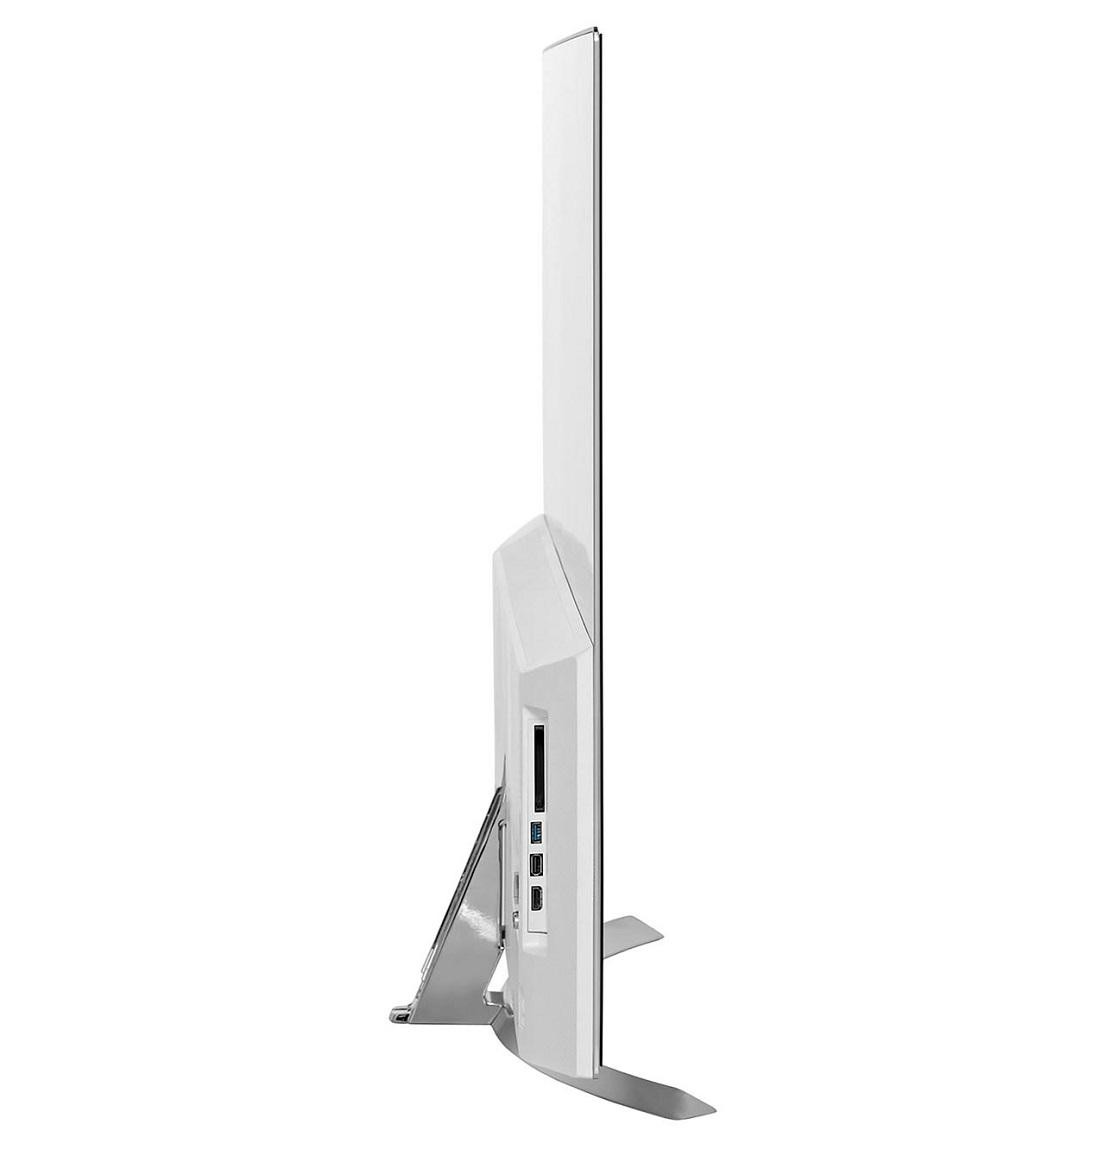 lg 55uh950v 55 inch 3d smart 4k ultra hd hdr led tv freeview hd freesat hd electrical deals. Black Bedroom Furniture Sets. Home Design Ideas